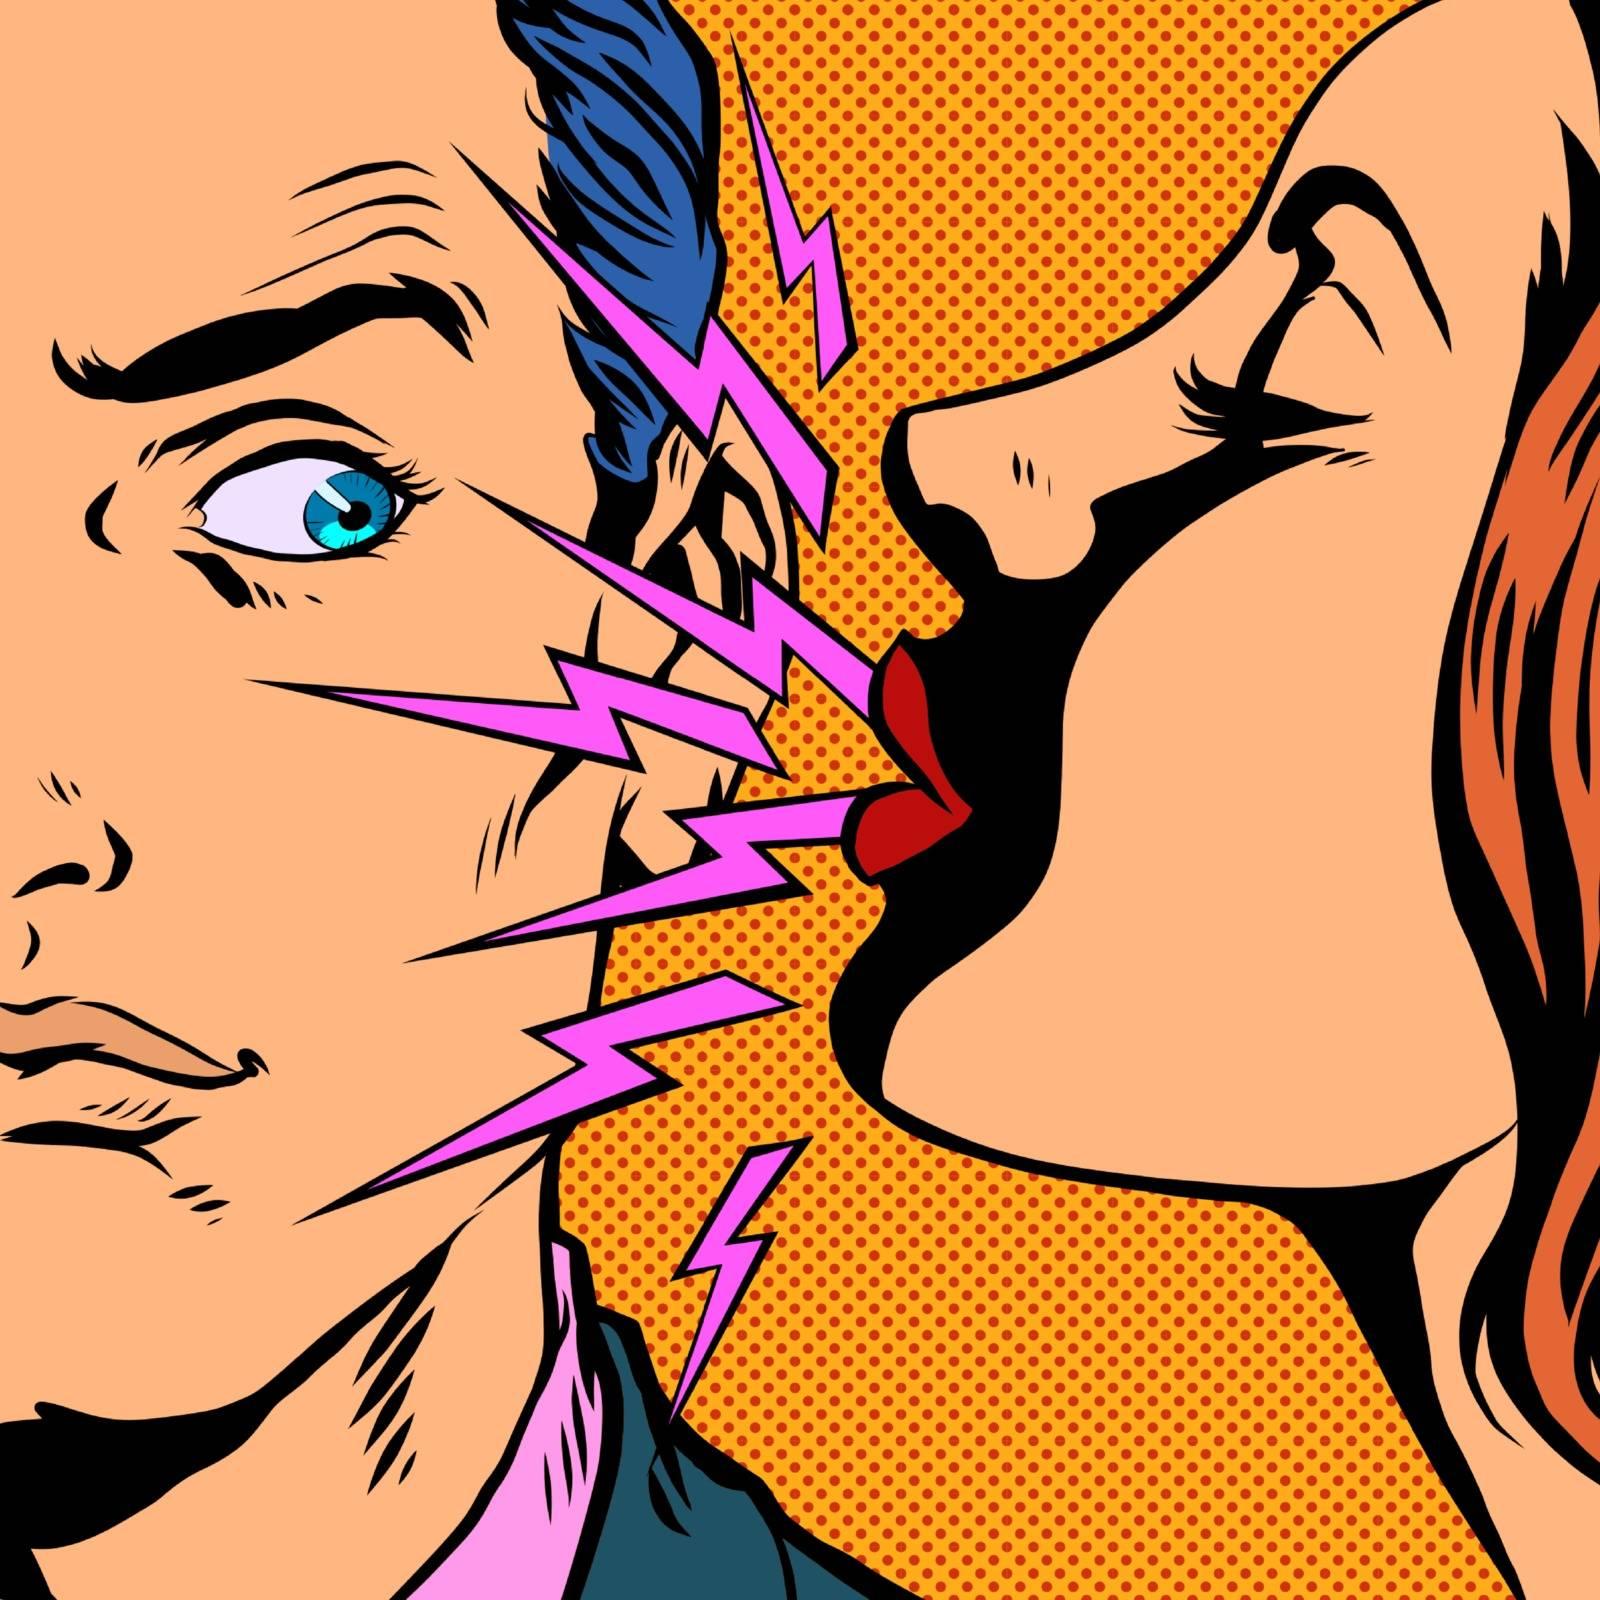 a woman sneezes at a man. Pop art retro vector illustration vintage kitsch 50s 60s style